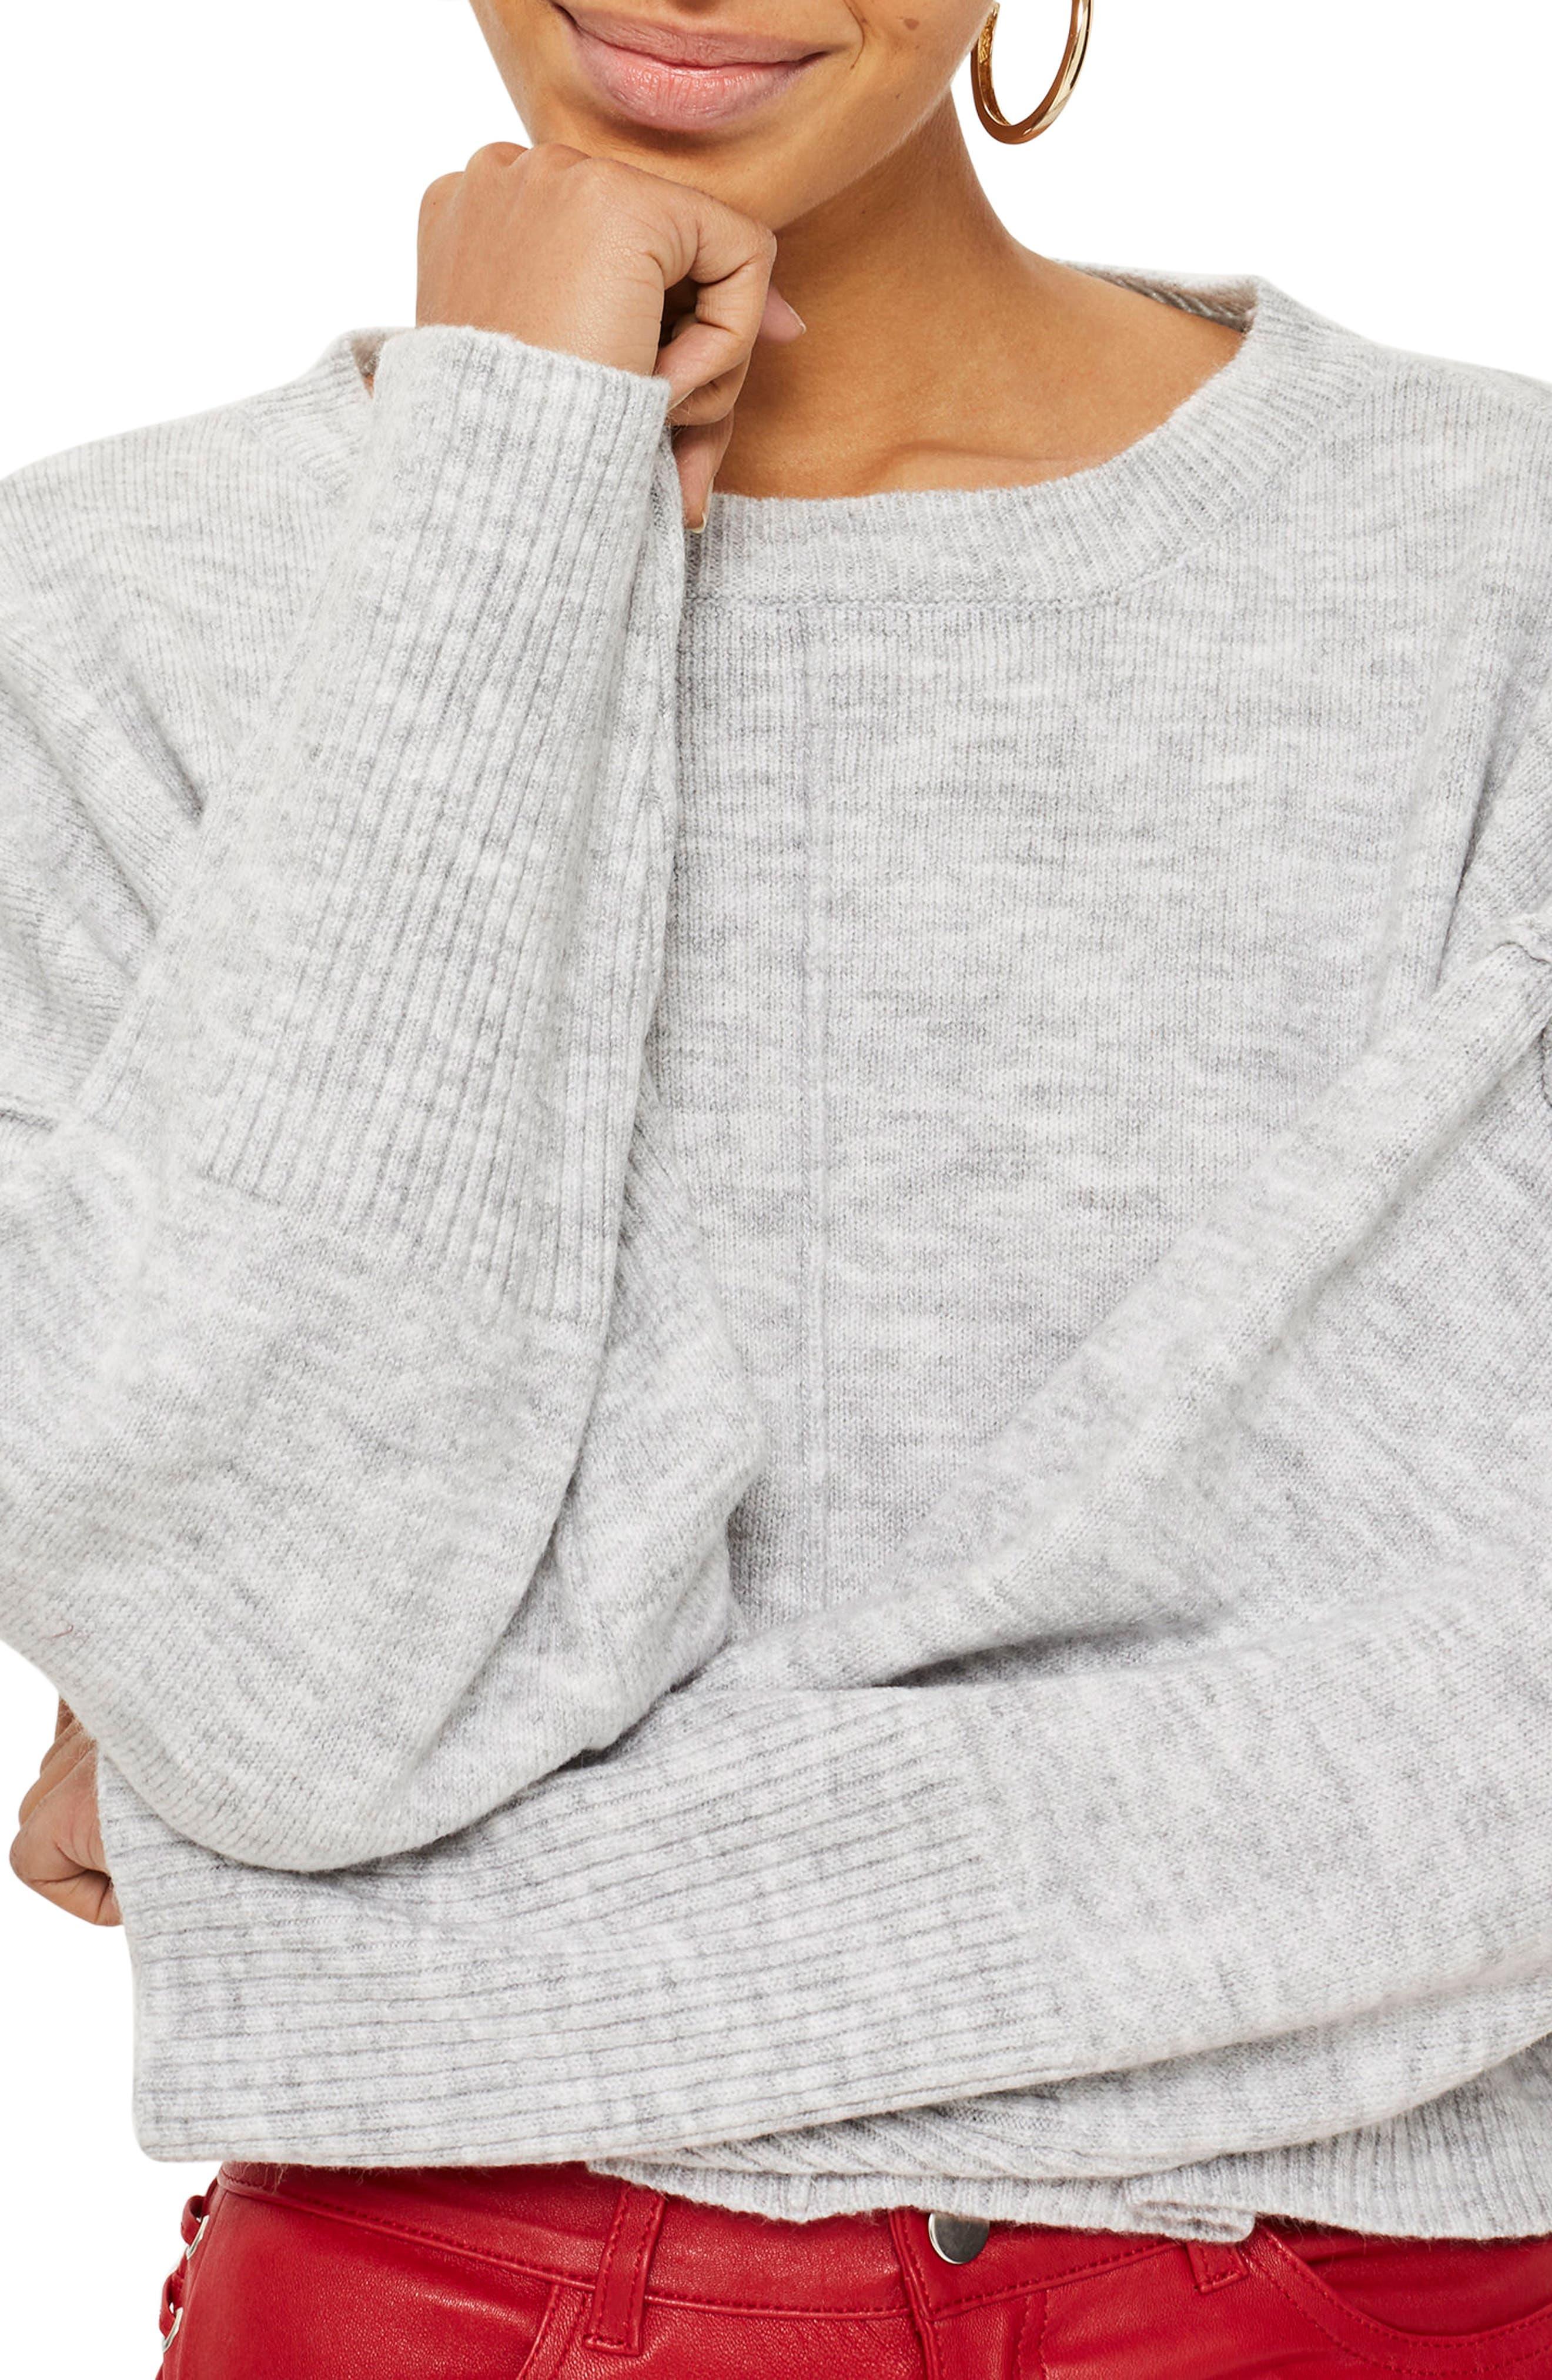 Alternate Image 1 Selected - Topshop Wide Sleeve Crop Sweater